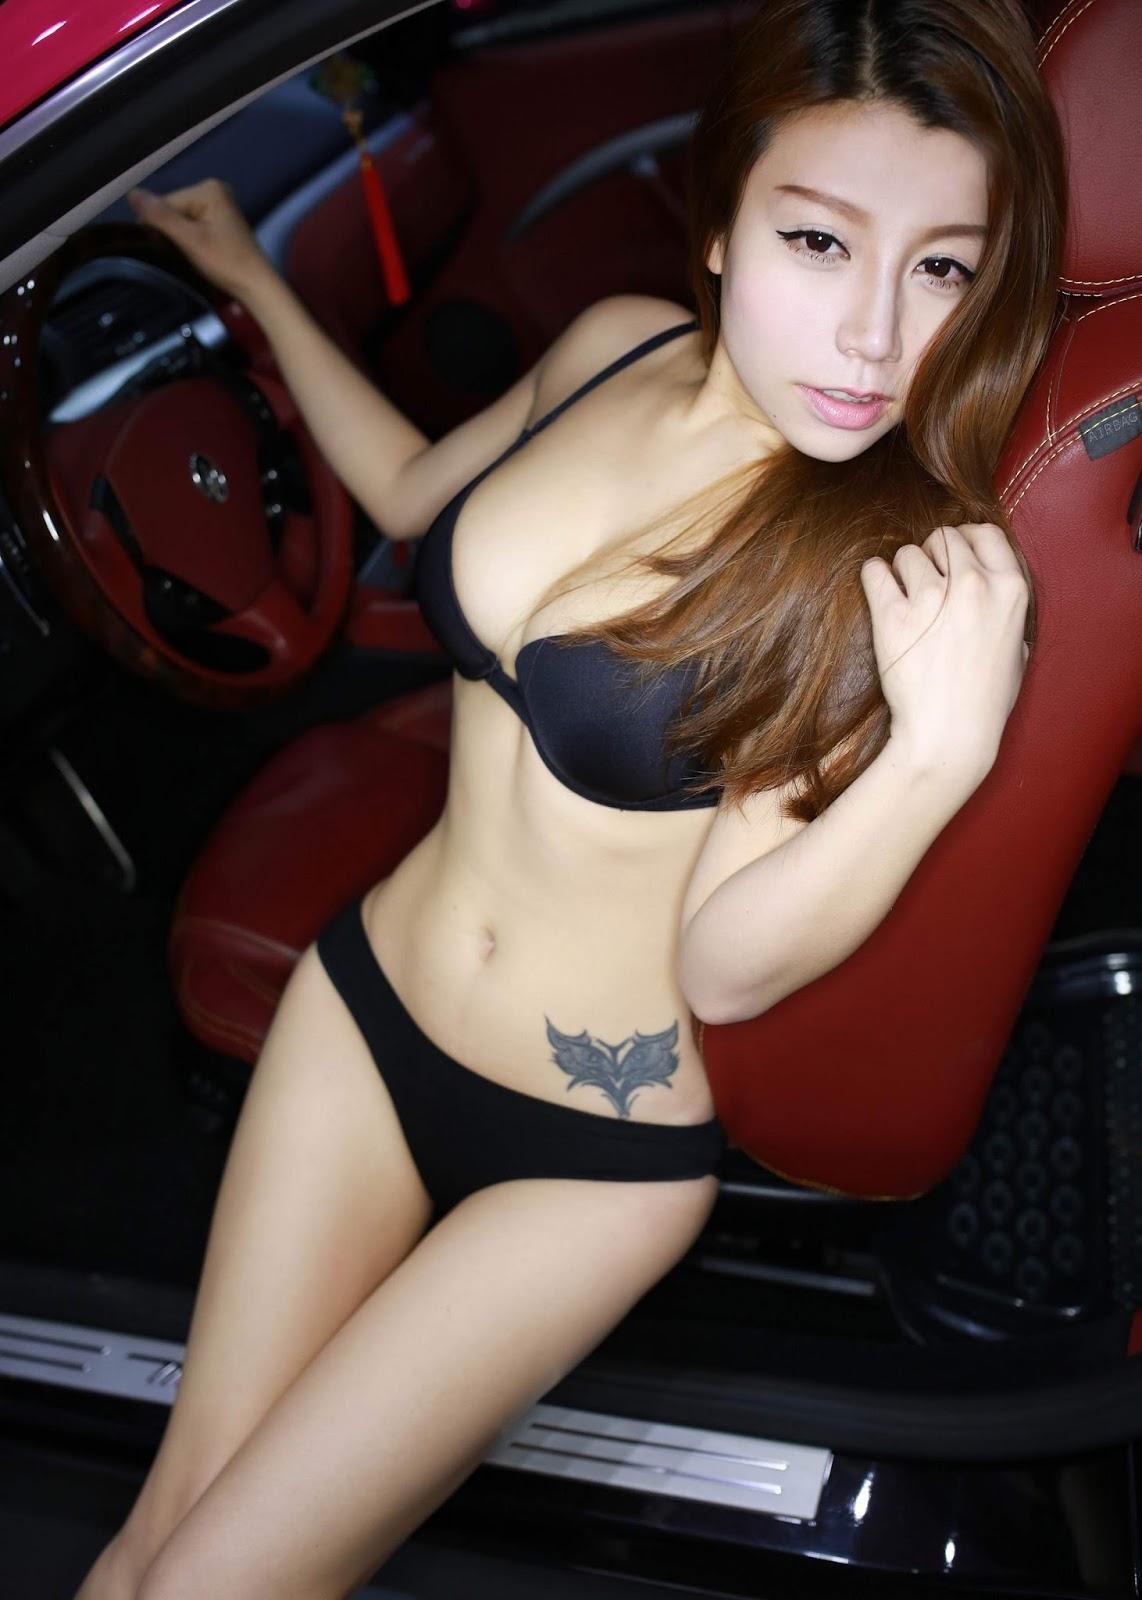 Asian Girl Jia Baobier Vetiver 嘉宝贝儿 Big Boobies Bikini Tempting Seamless Bodies